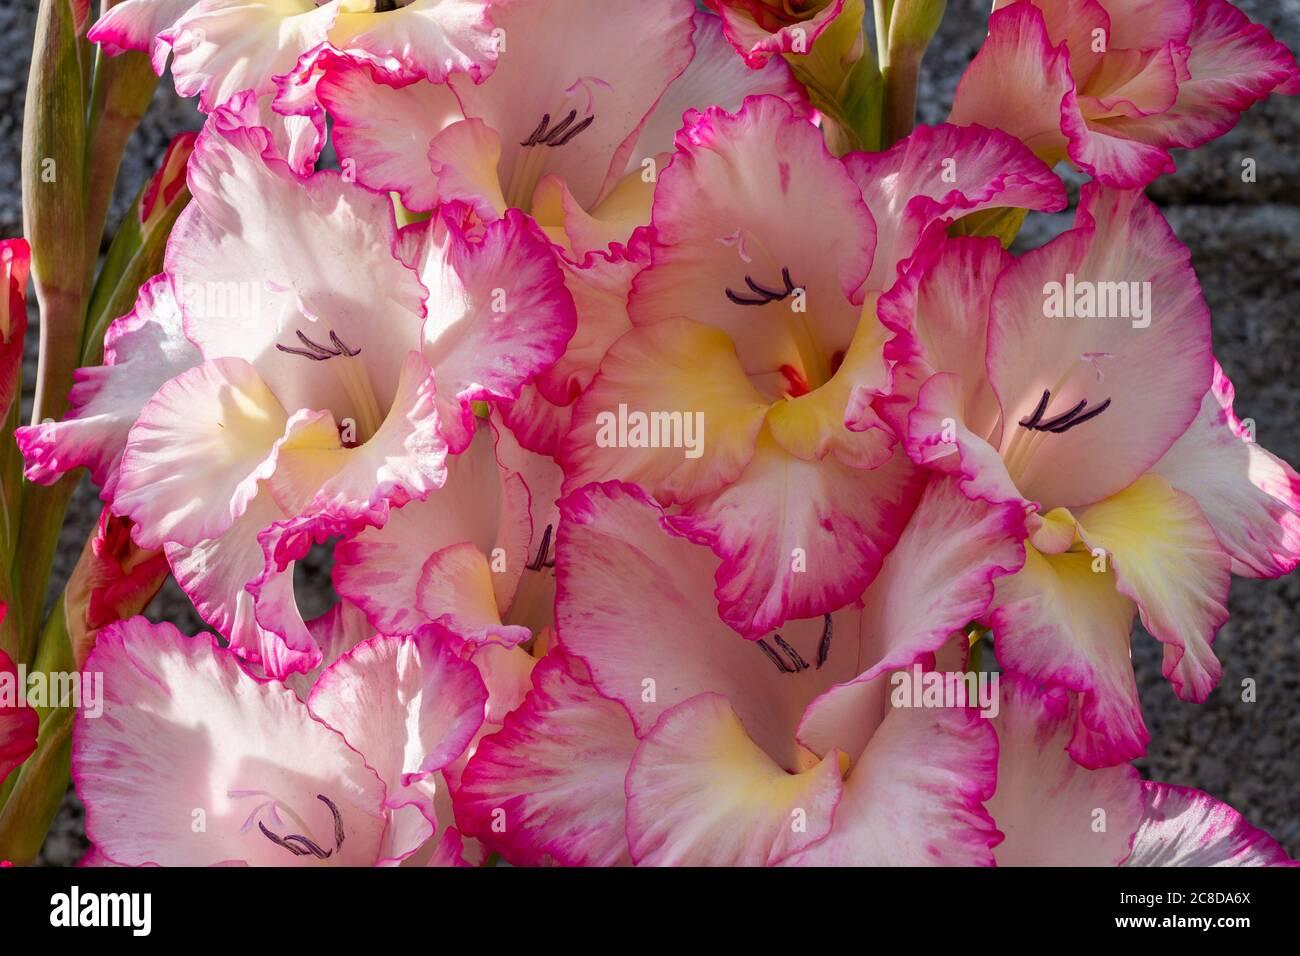 gladiolus-priscilla-in-full-summer-flower-2C8DA6X.jpg